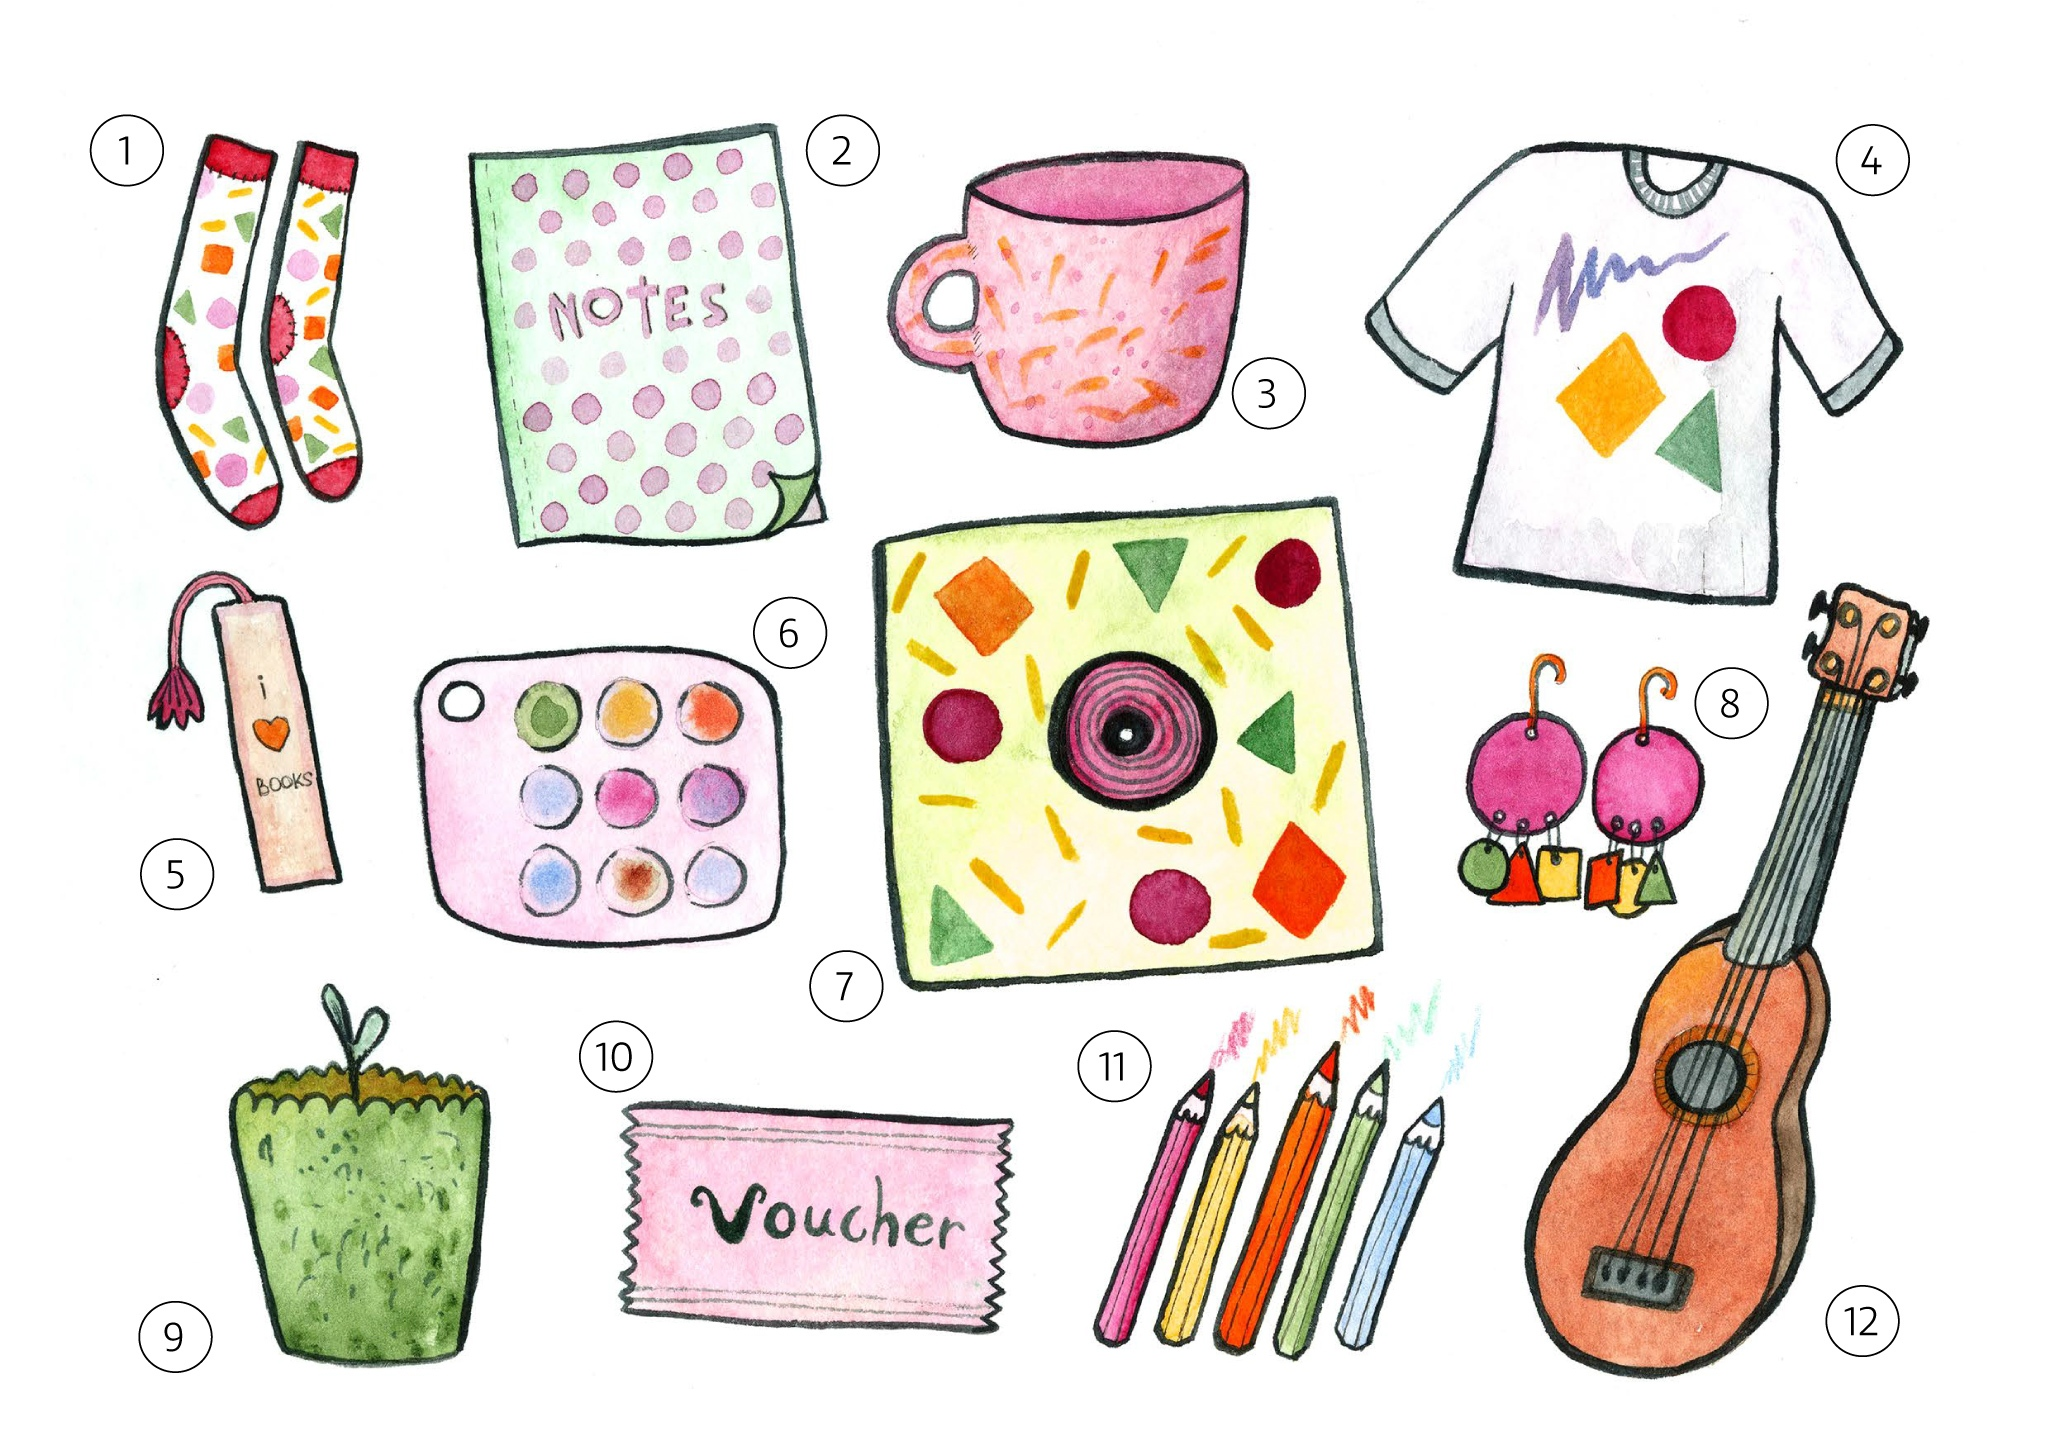 Creative gift guide